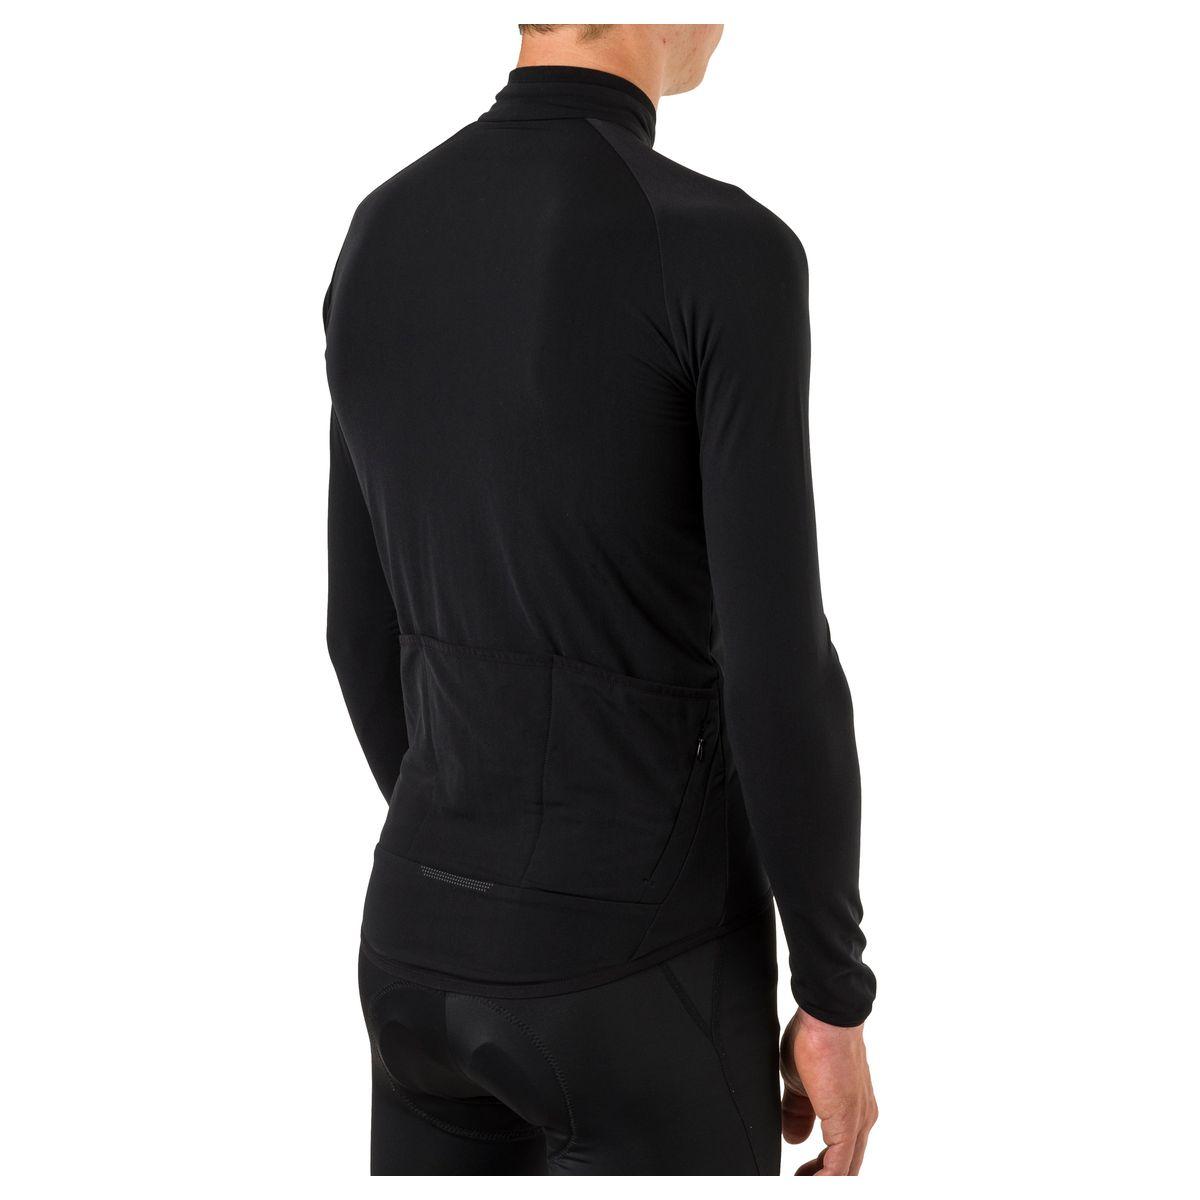 Thermo Fietsshirt Lange Mouwen Essential Heren fit example